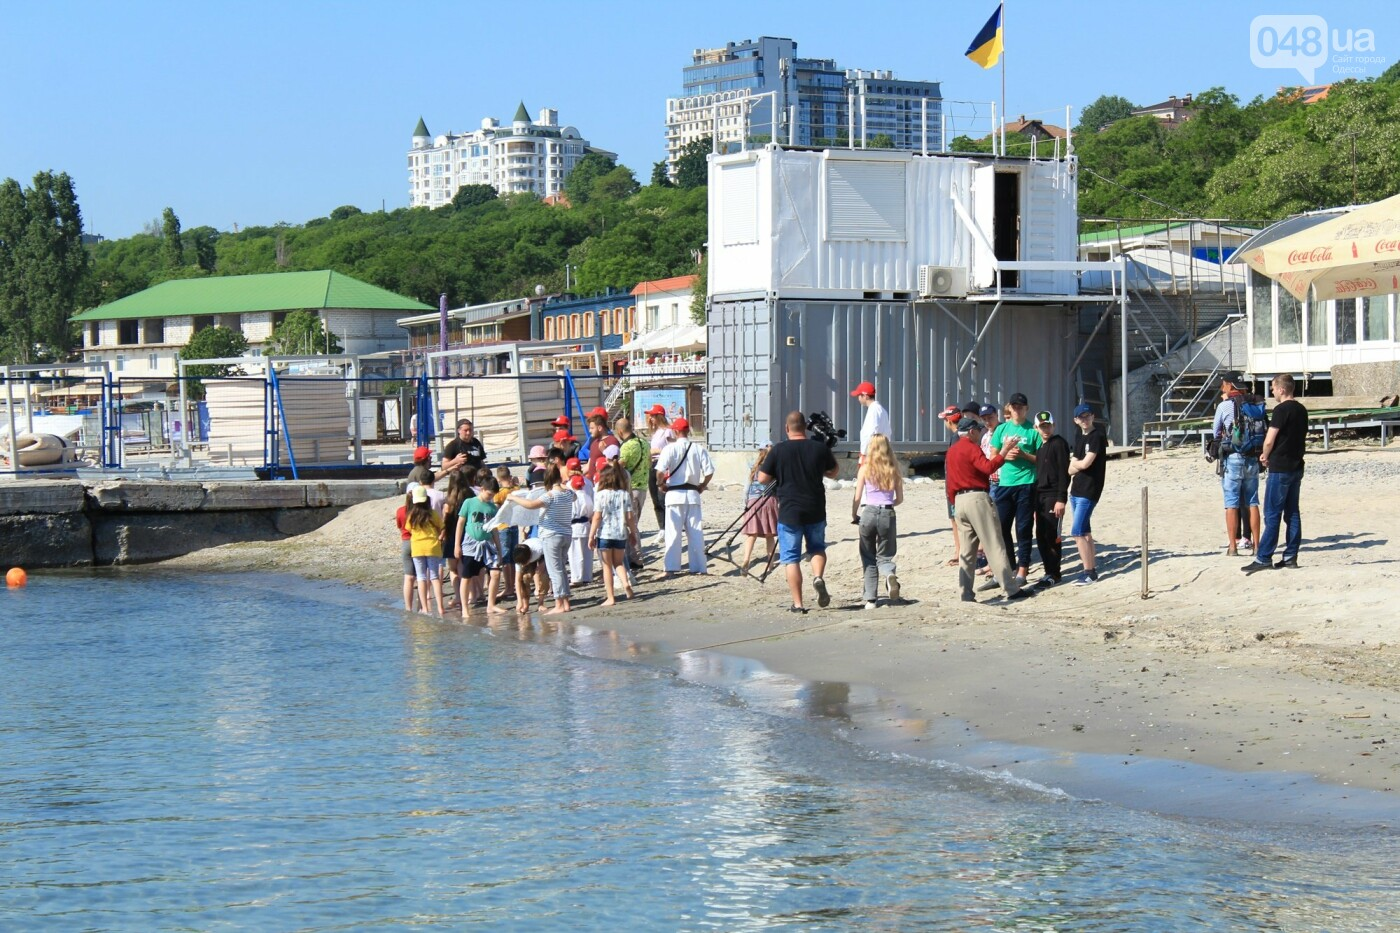 Школьники спасали утопающих: на Ланжероне в Одессе провели учения, - ФОТО, ВИДЕО , фото-1